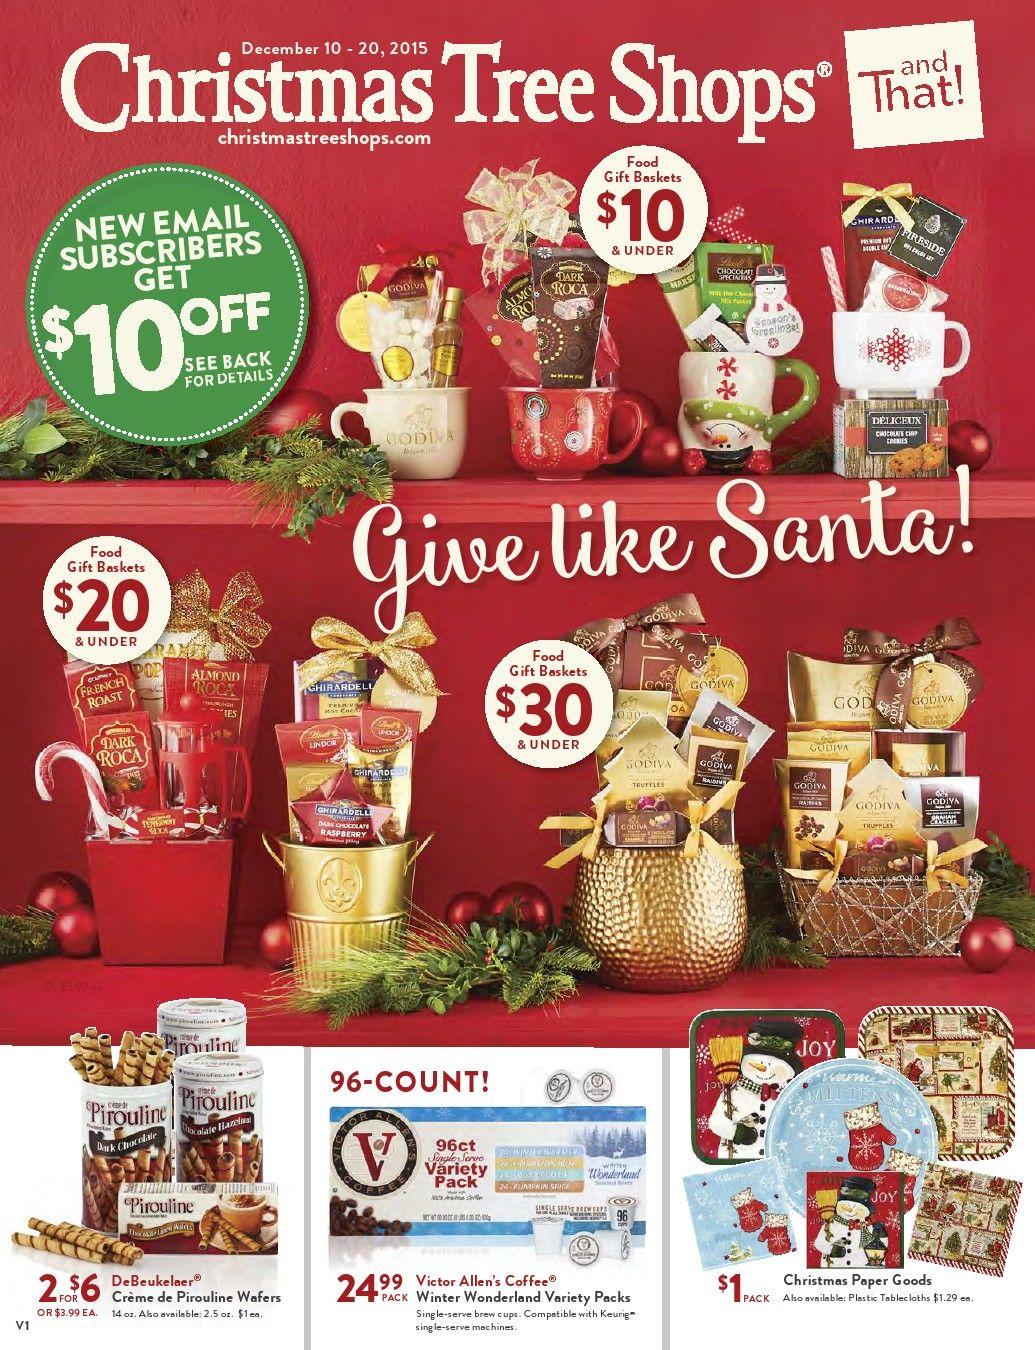 Christmas Tree Shops Ad December 10 20, 2015 http